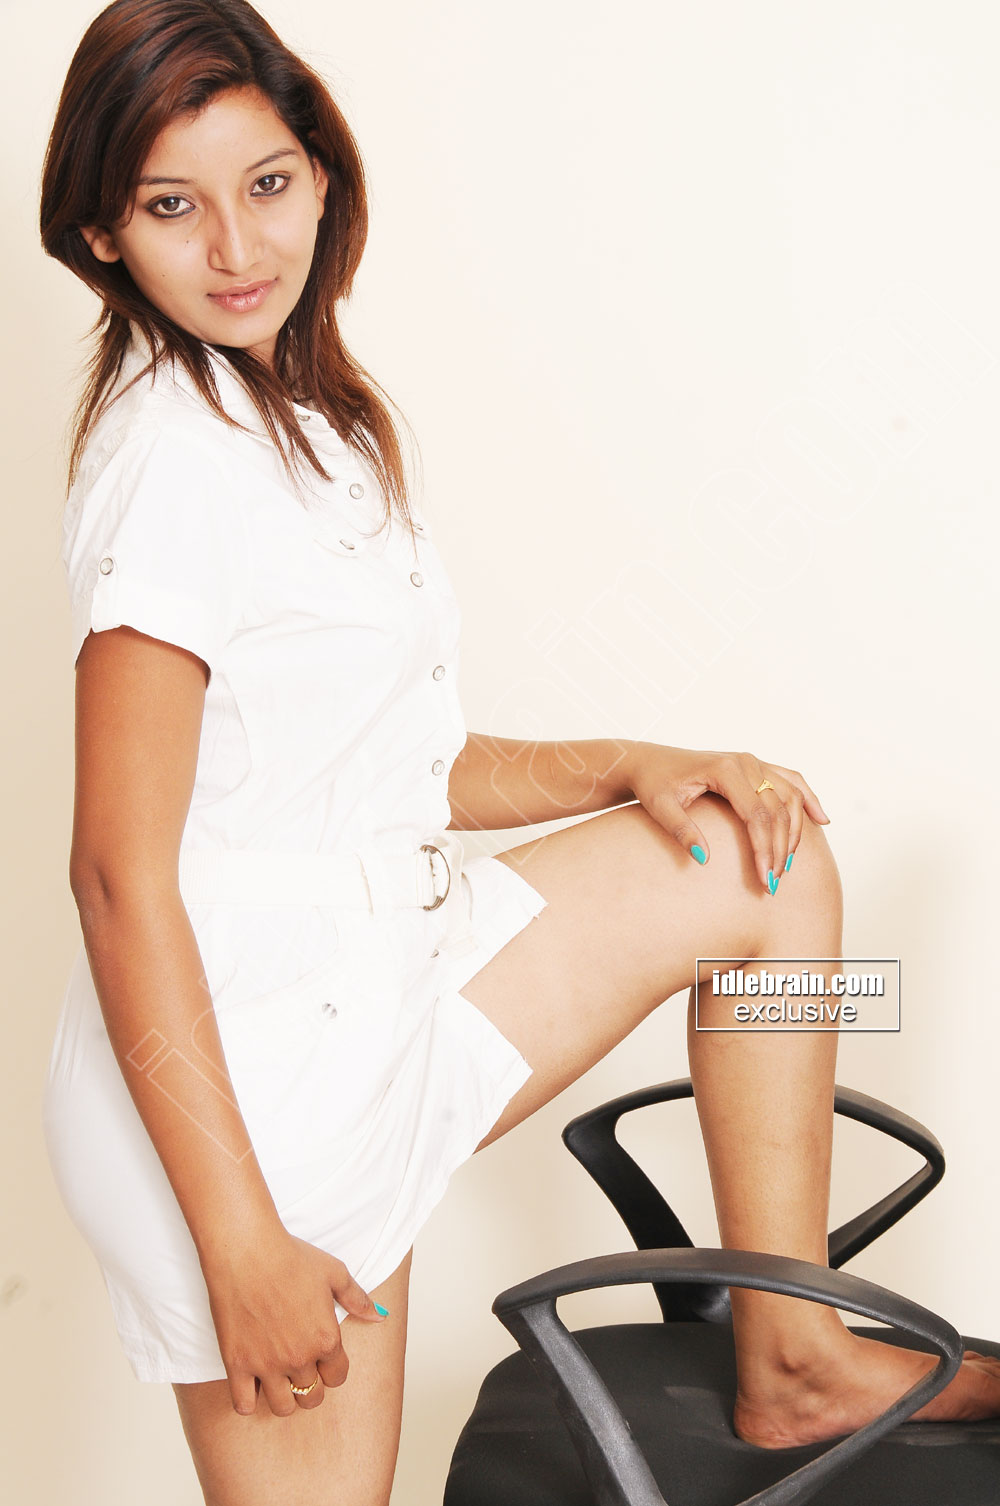 bollywood hot actress without clothes: Actress Vinny Latest Hot Photos